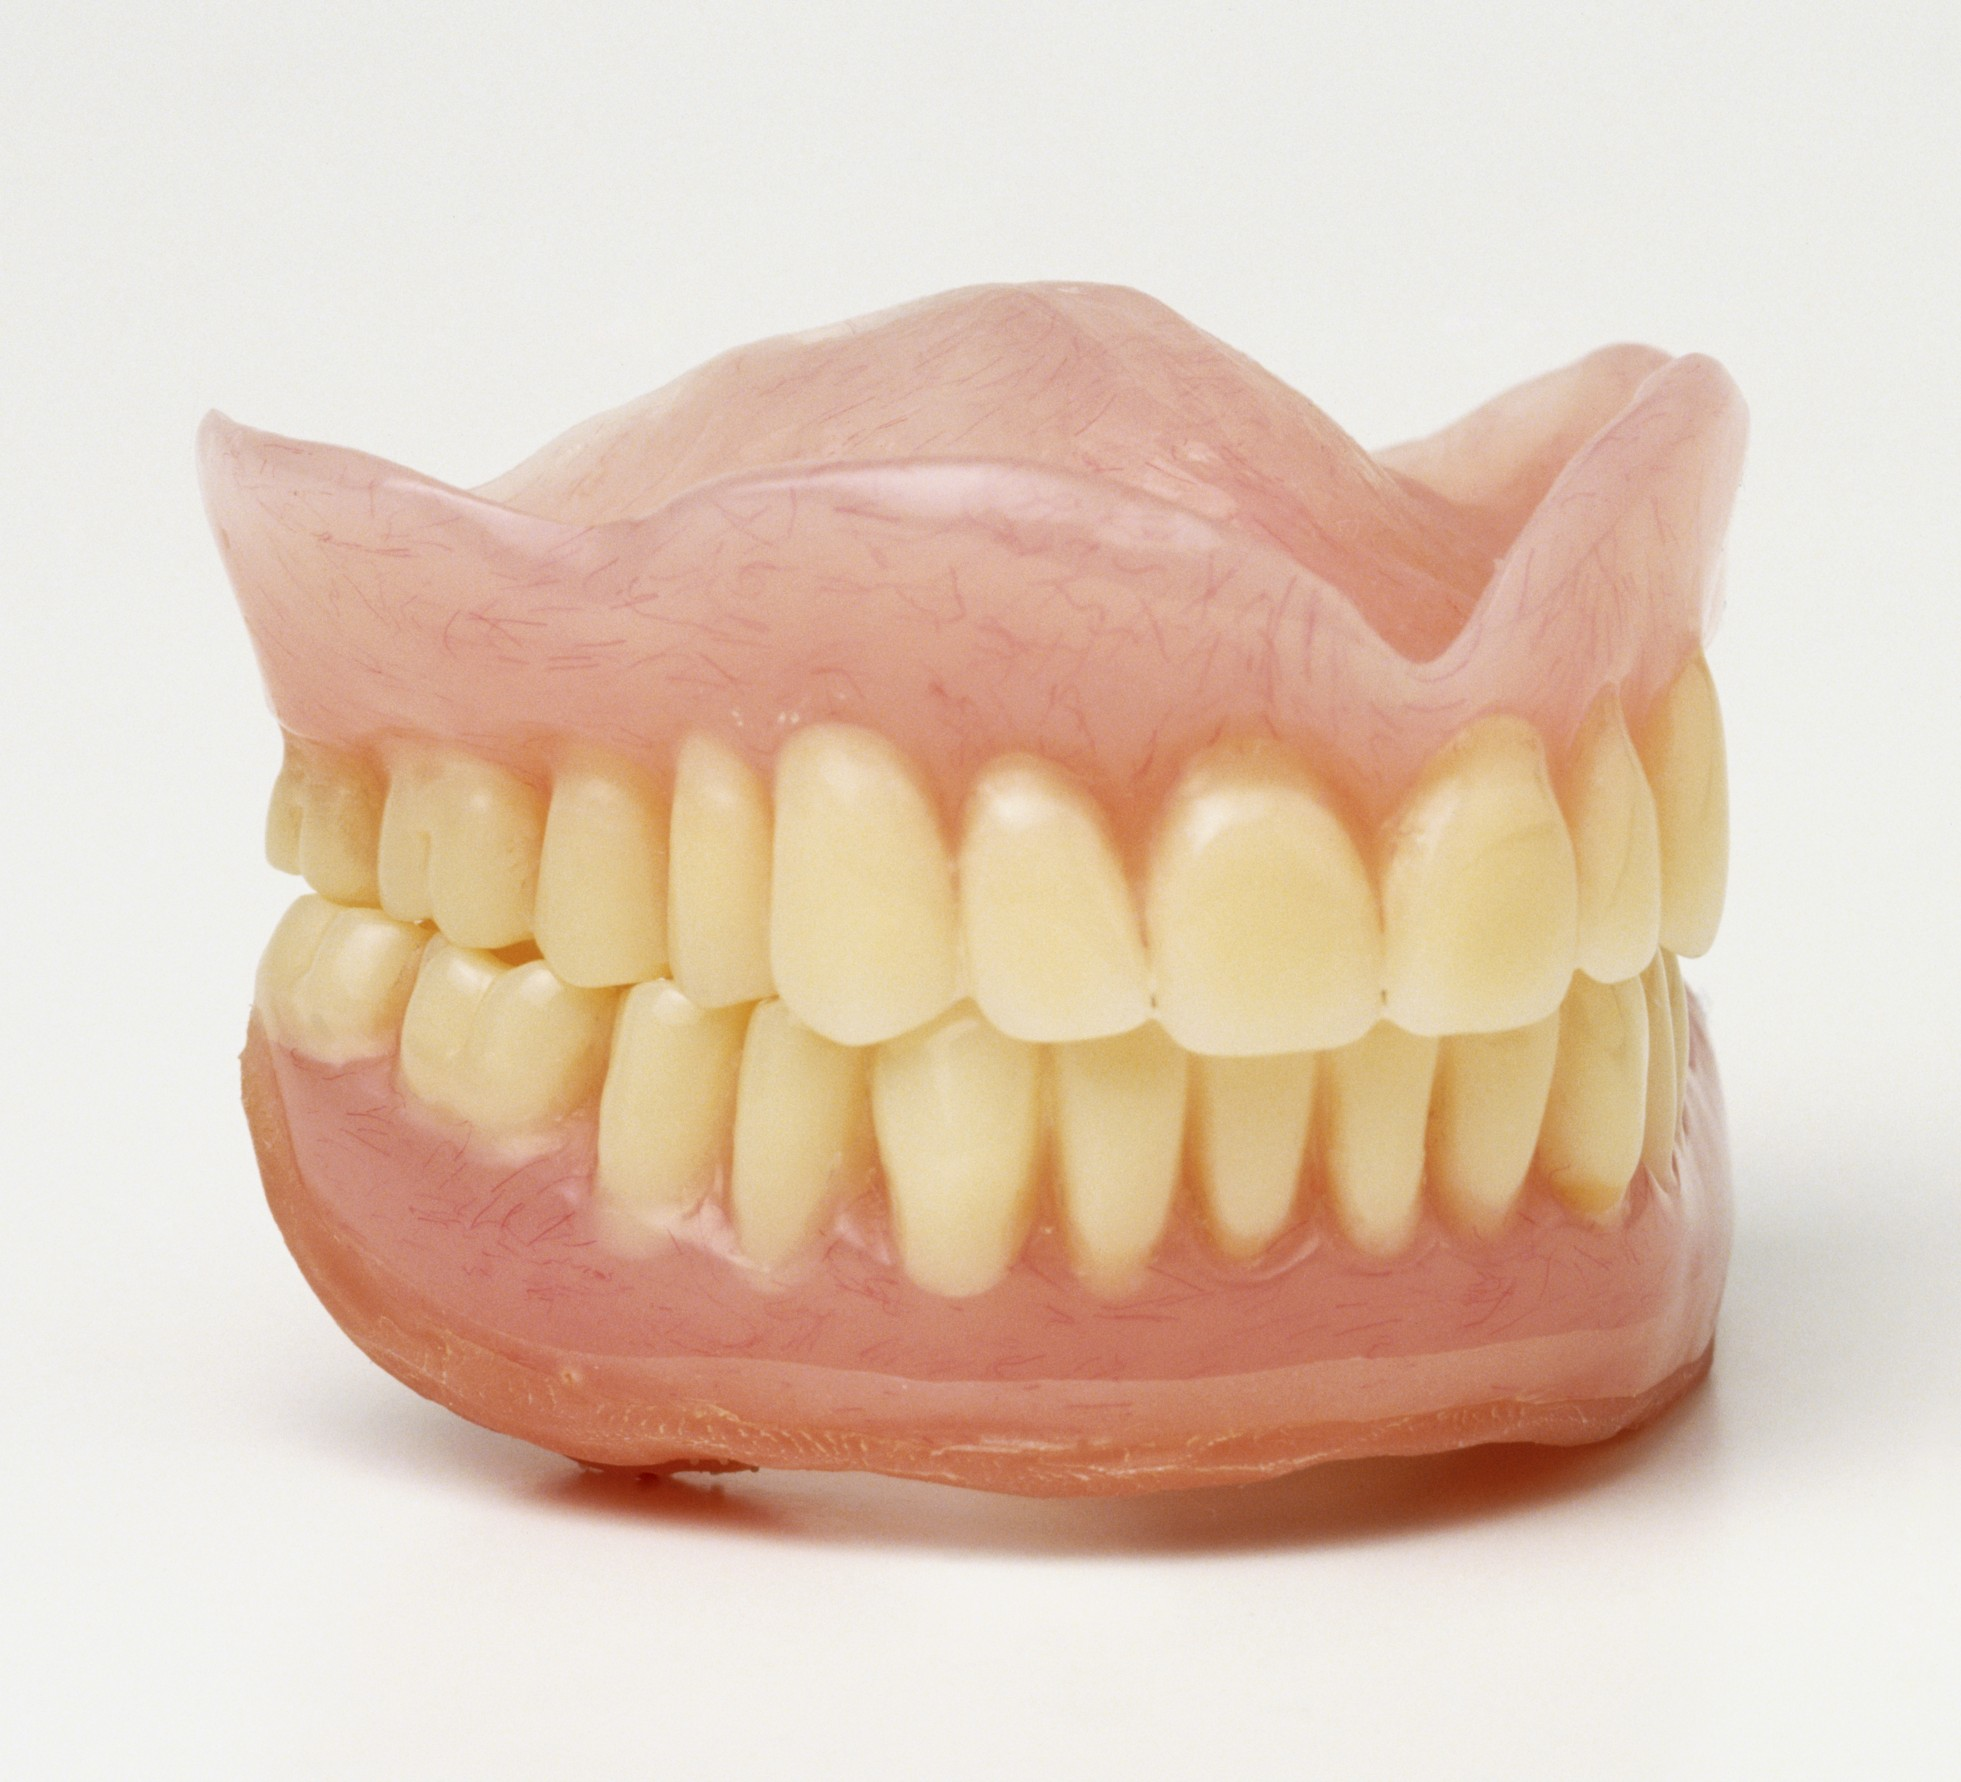 Dental hygiene in an Emergency - Preparedness ...